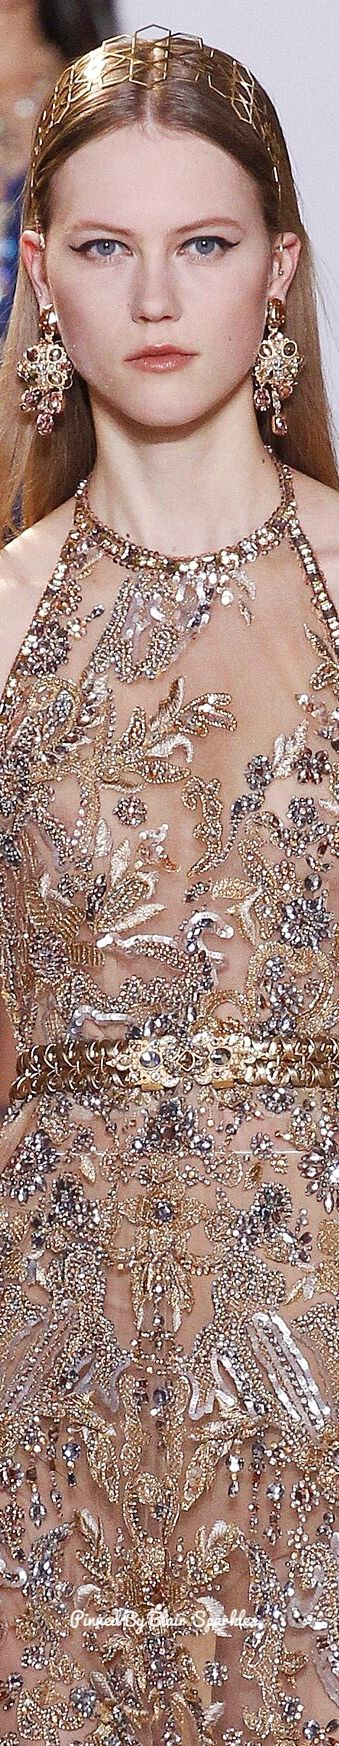 Elie Saab Spring Couture 2017: